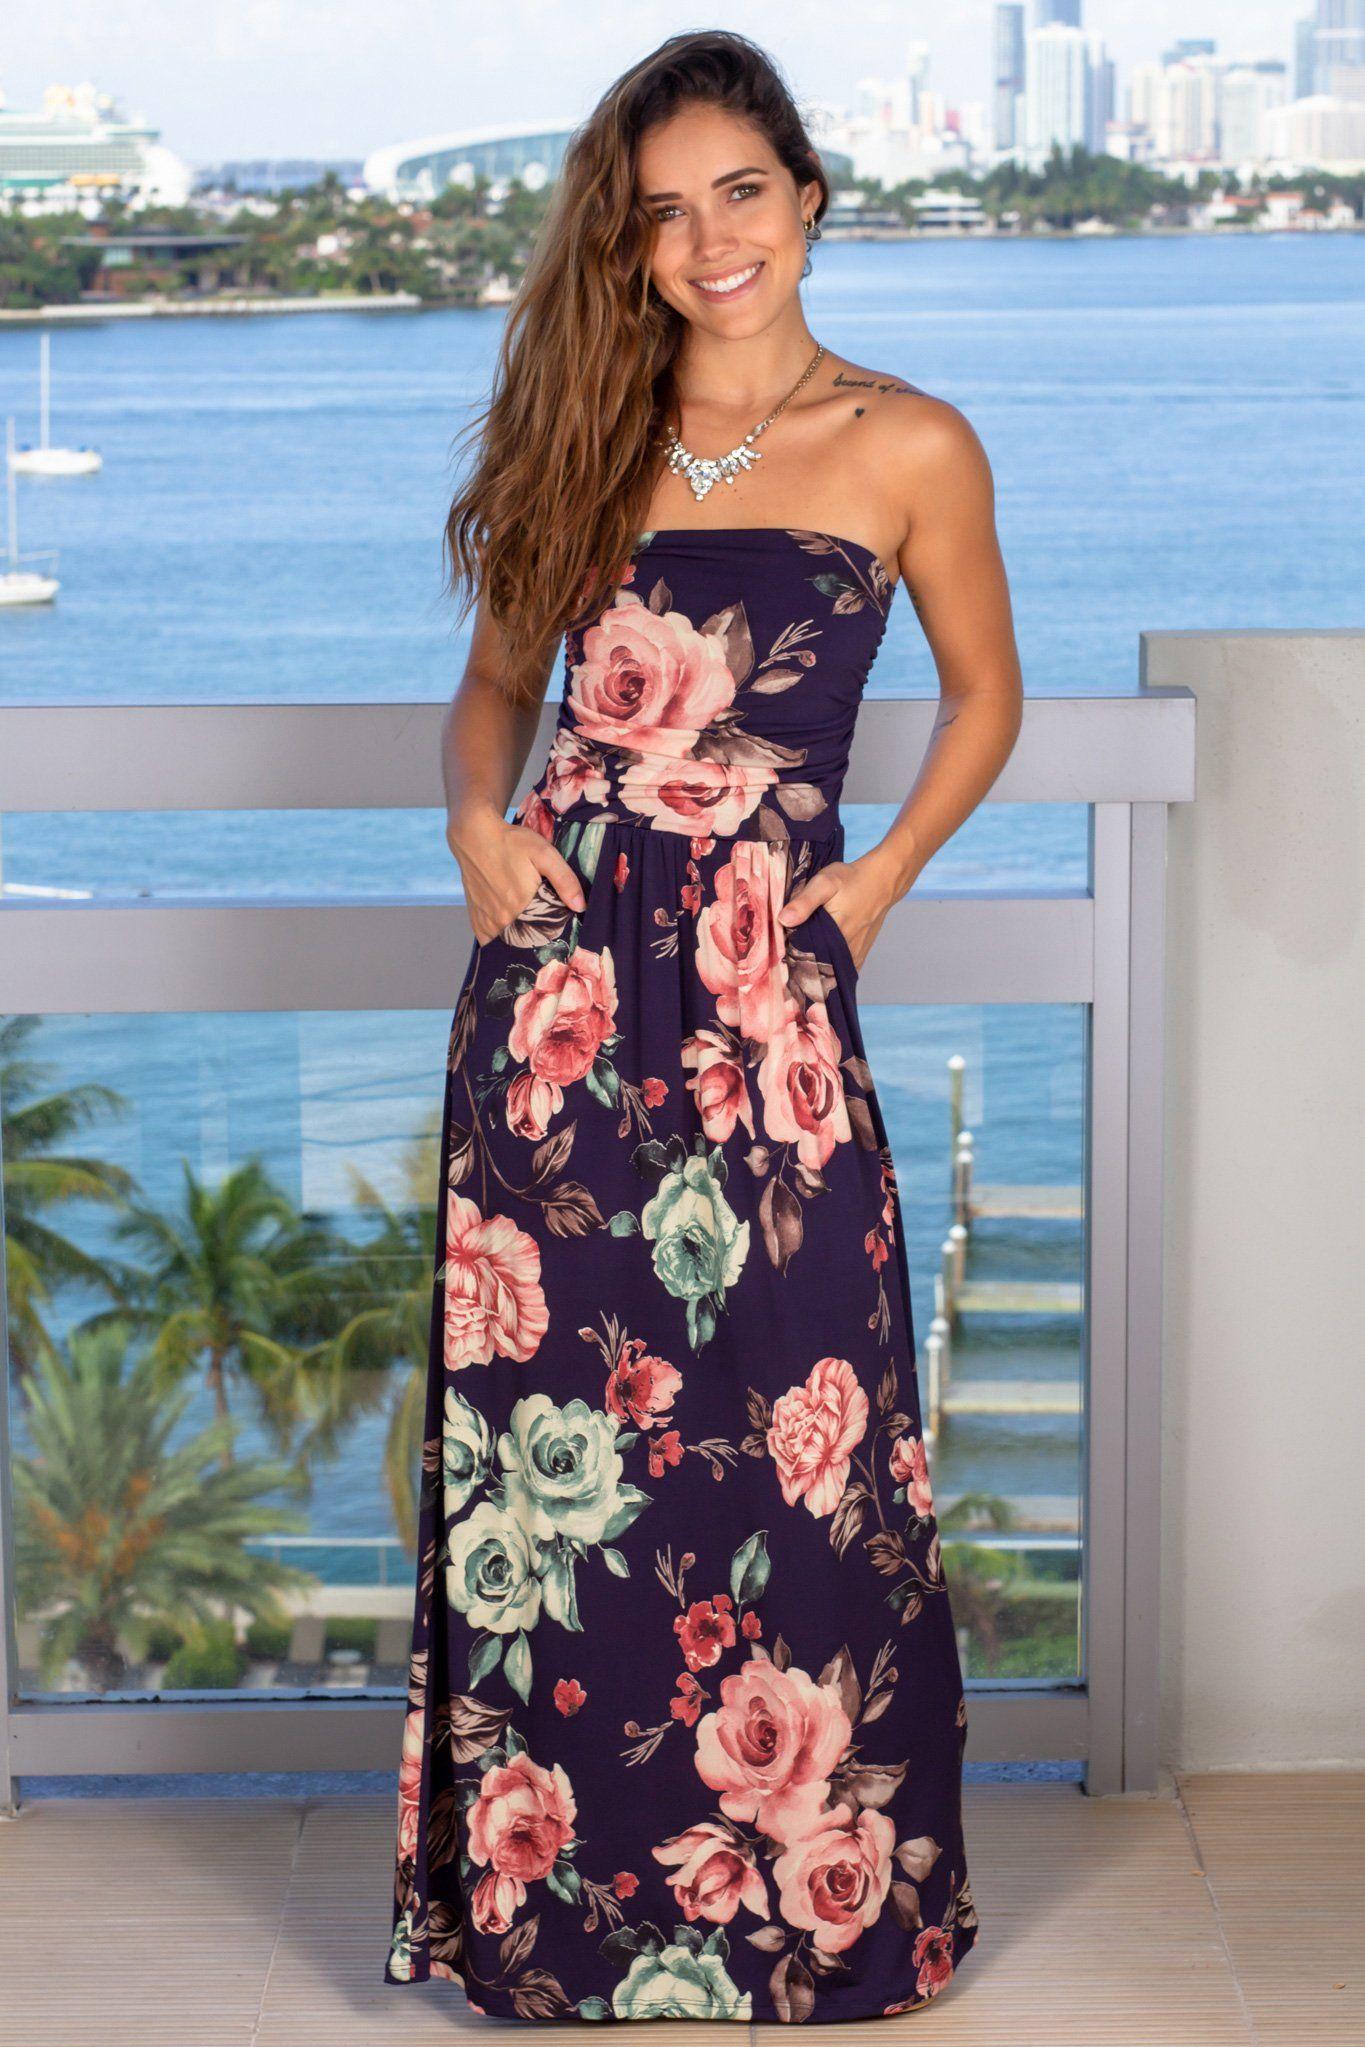 Navy Strapless Floral Maxi Dress Maxi Dress Dresses Floral Maxi Dress [ 2047 x 1365 Pixel ]